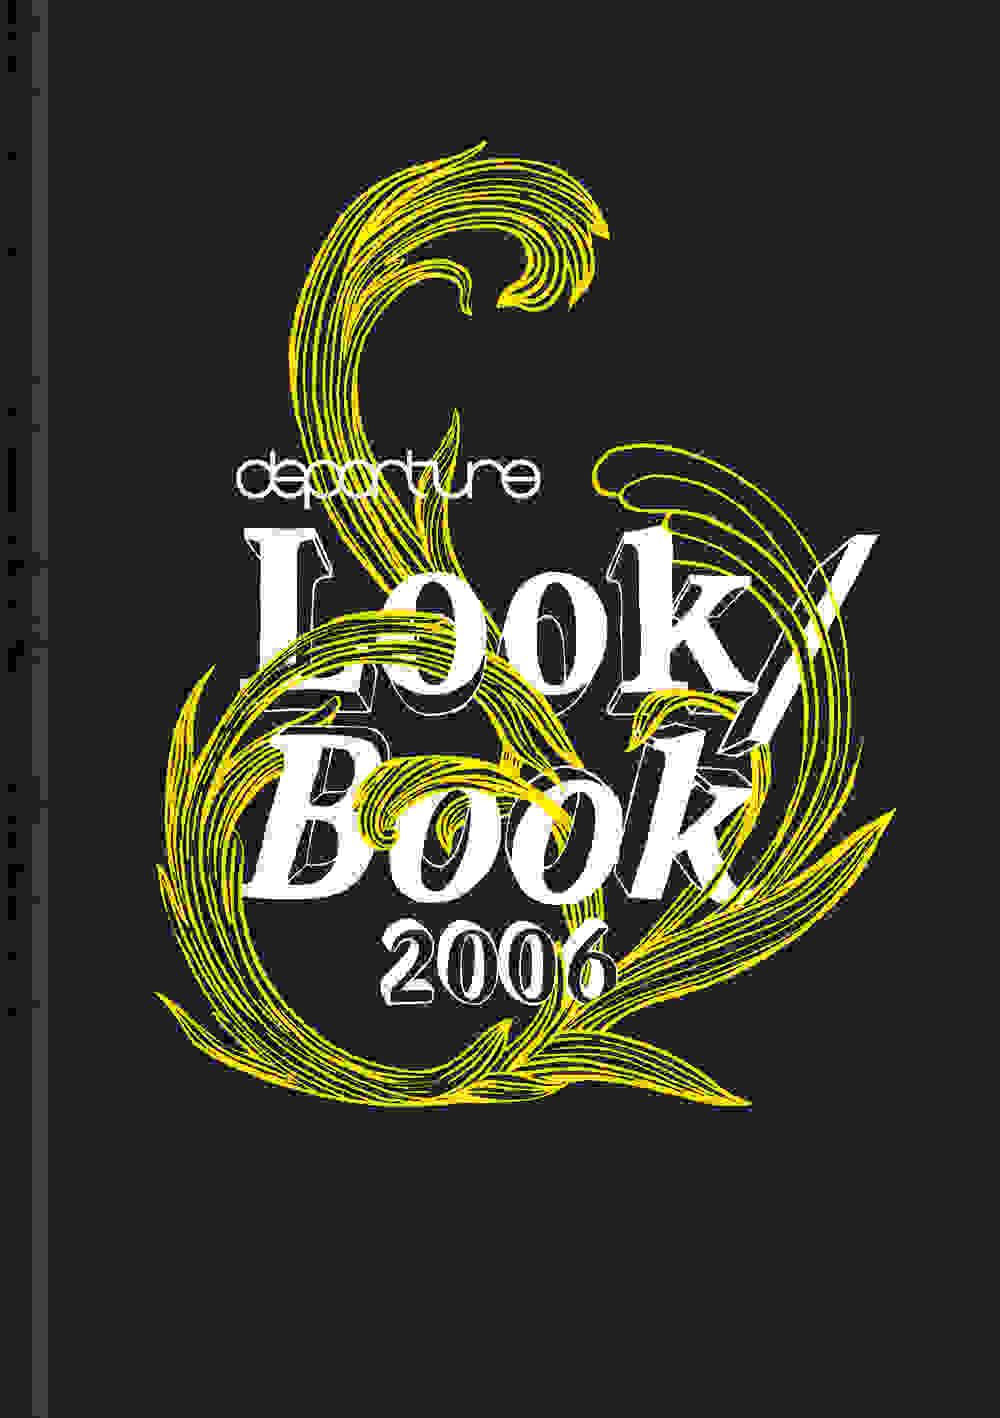 Departure Lookbook2006 Cover 00